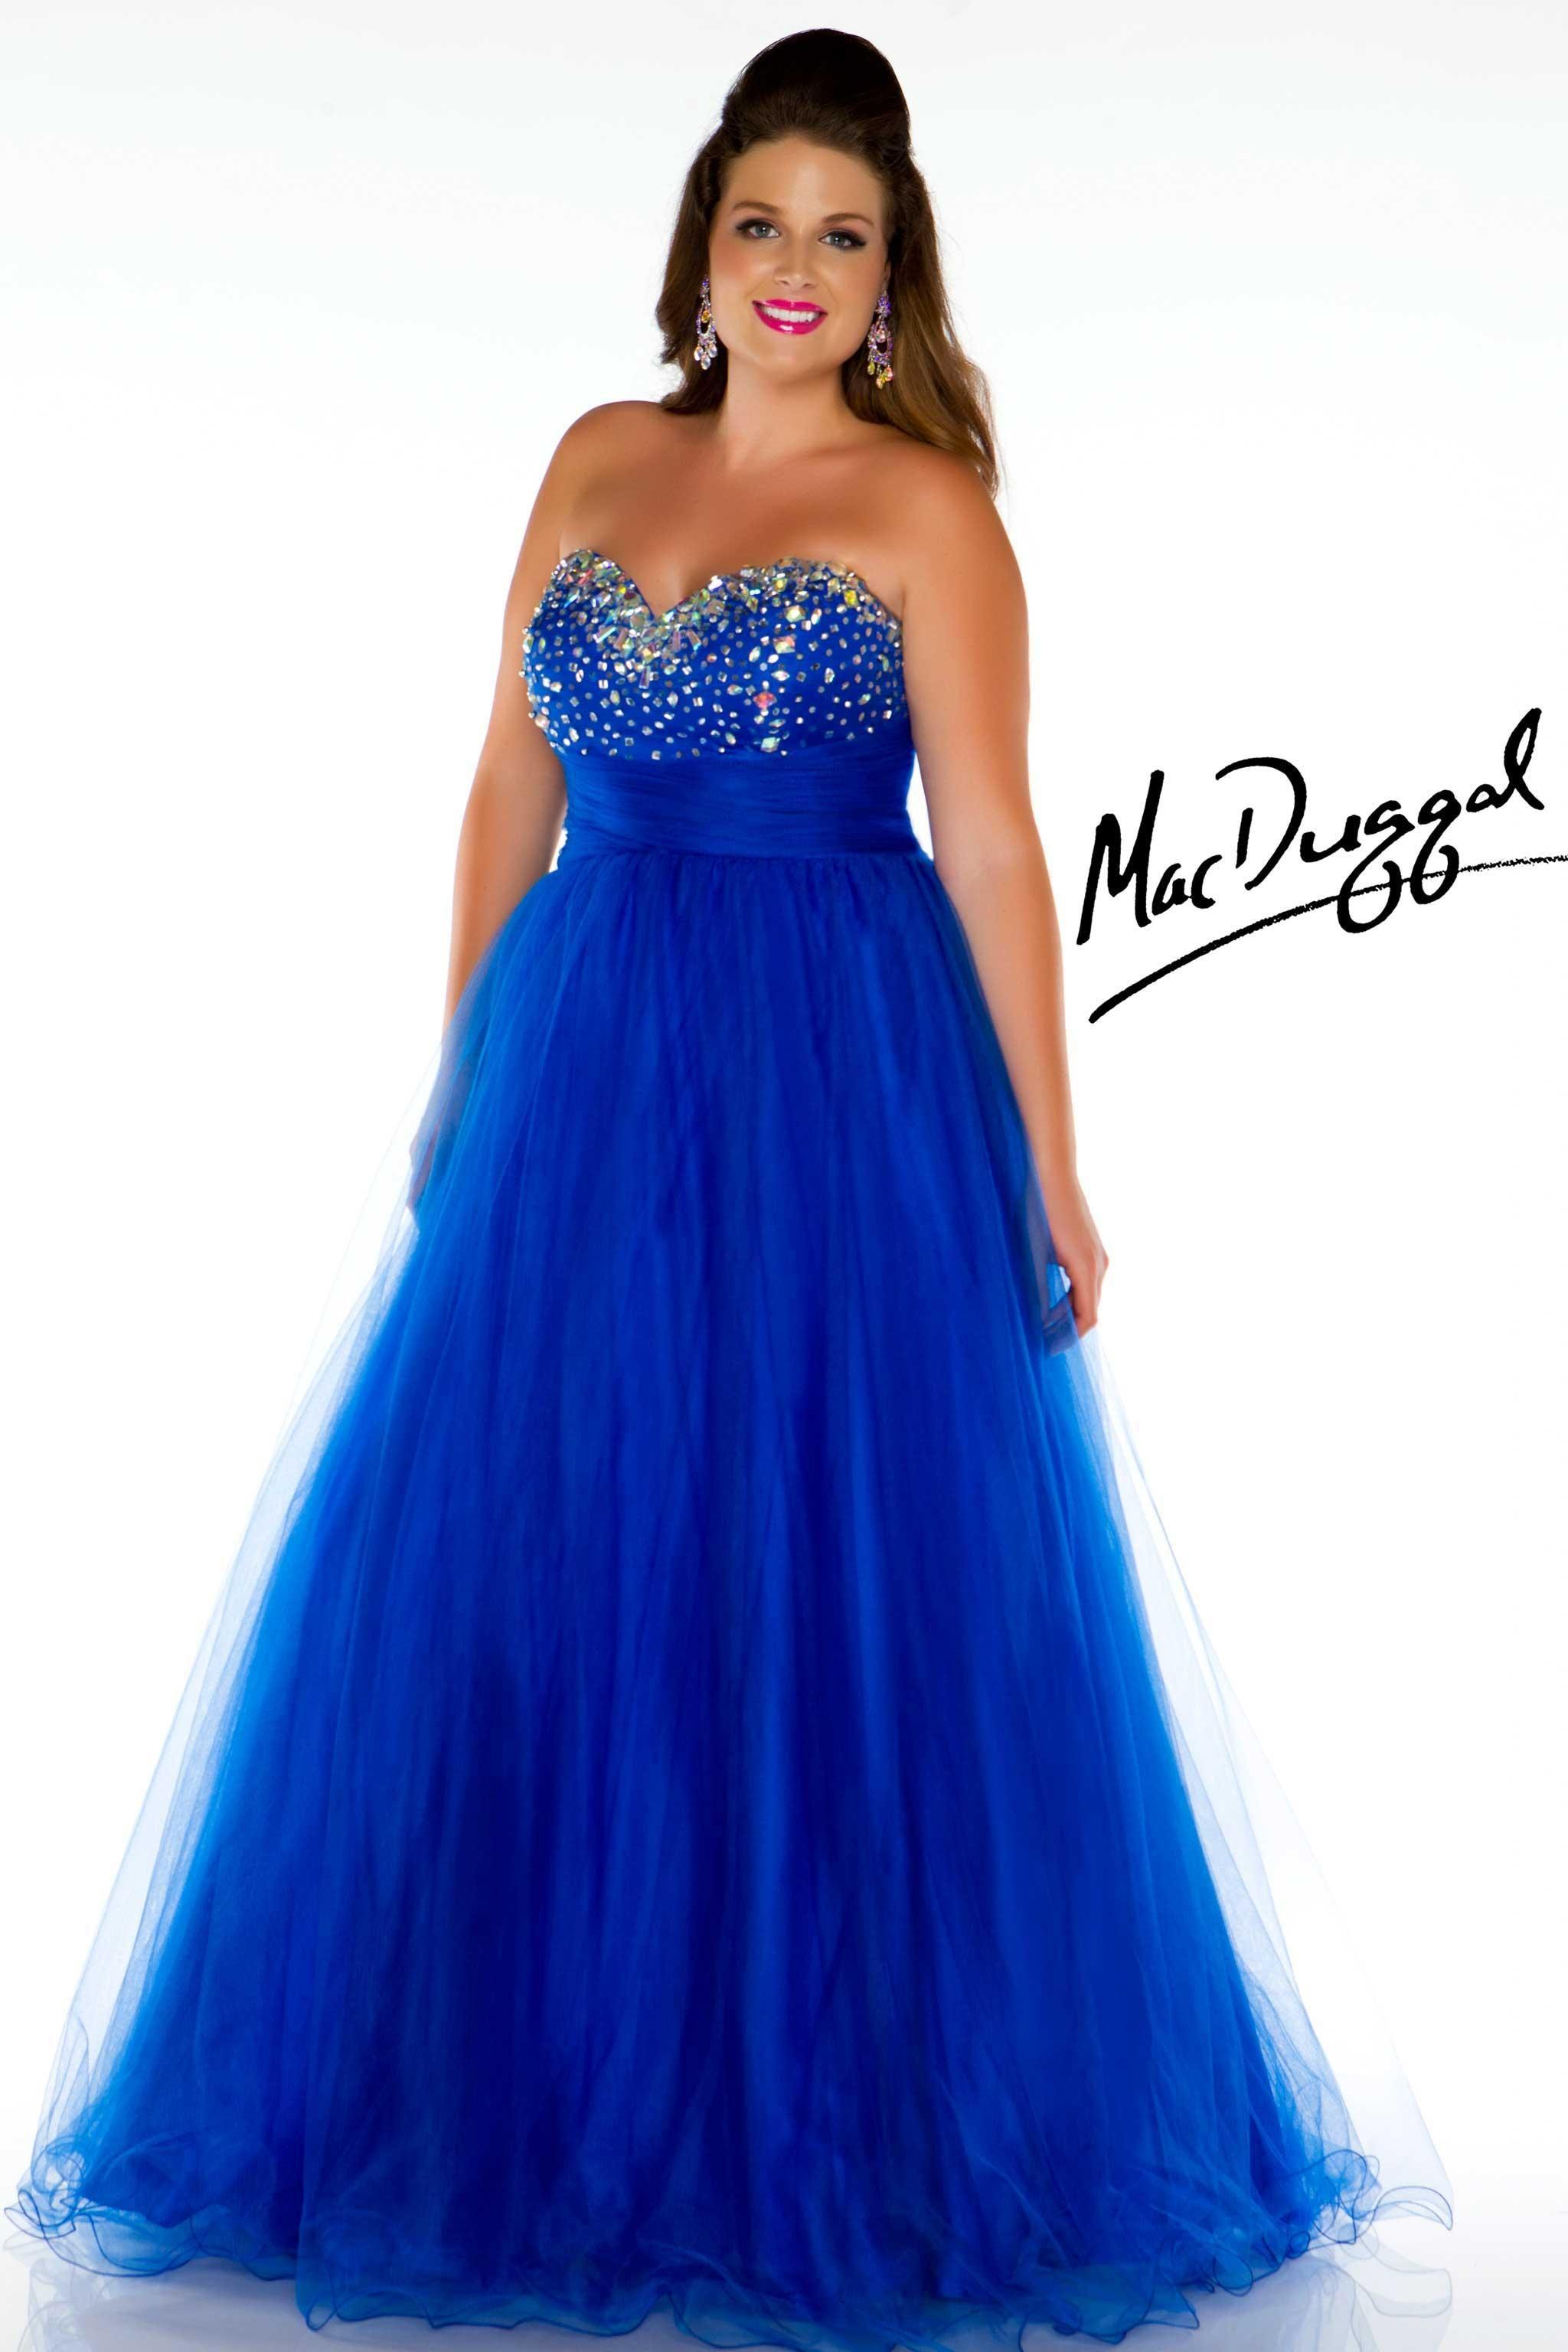 Royal Blue Strapless Plus Size Prom Dress | Mac Duggal 76424K | Prom ...